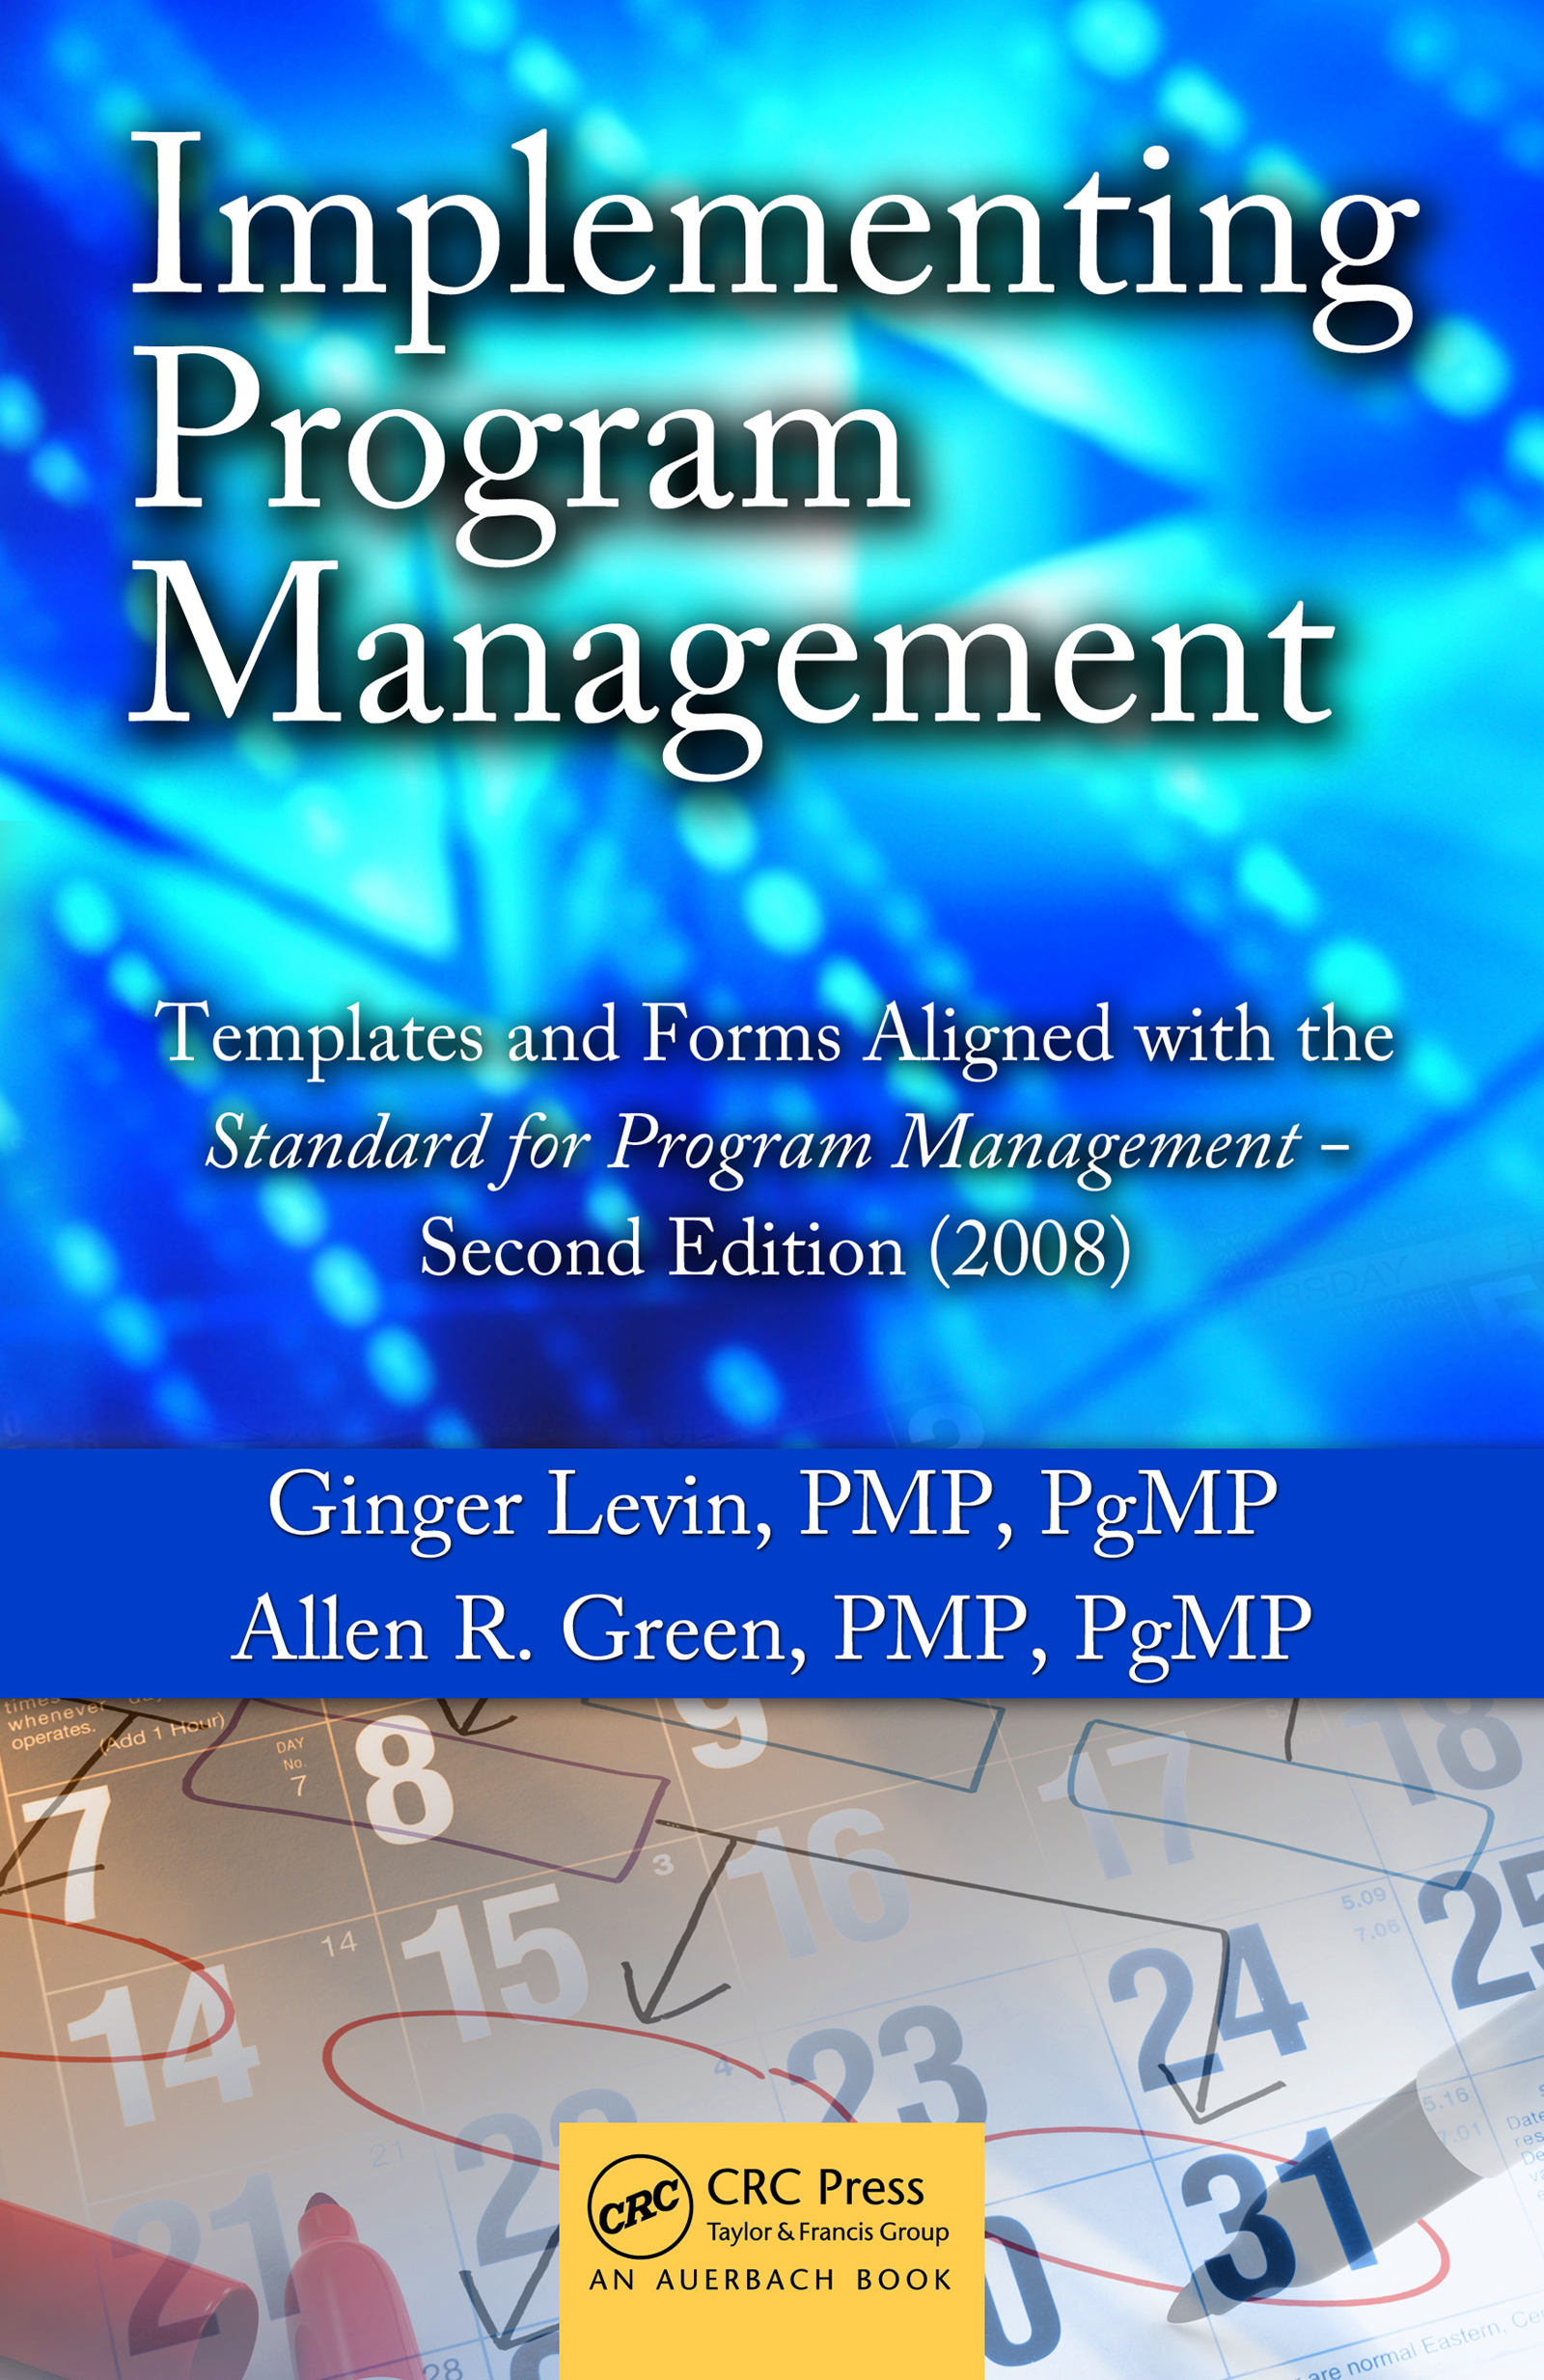 Download Ebook Implementing Program Management (2nd ed.) by Ginger Levin Pdf